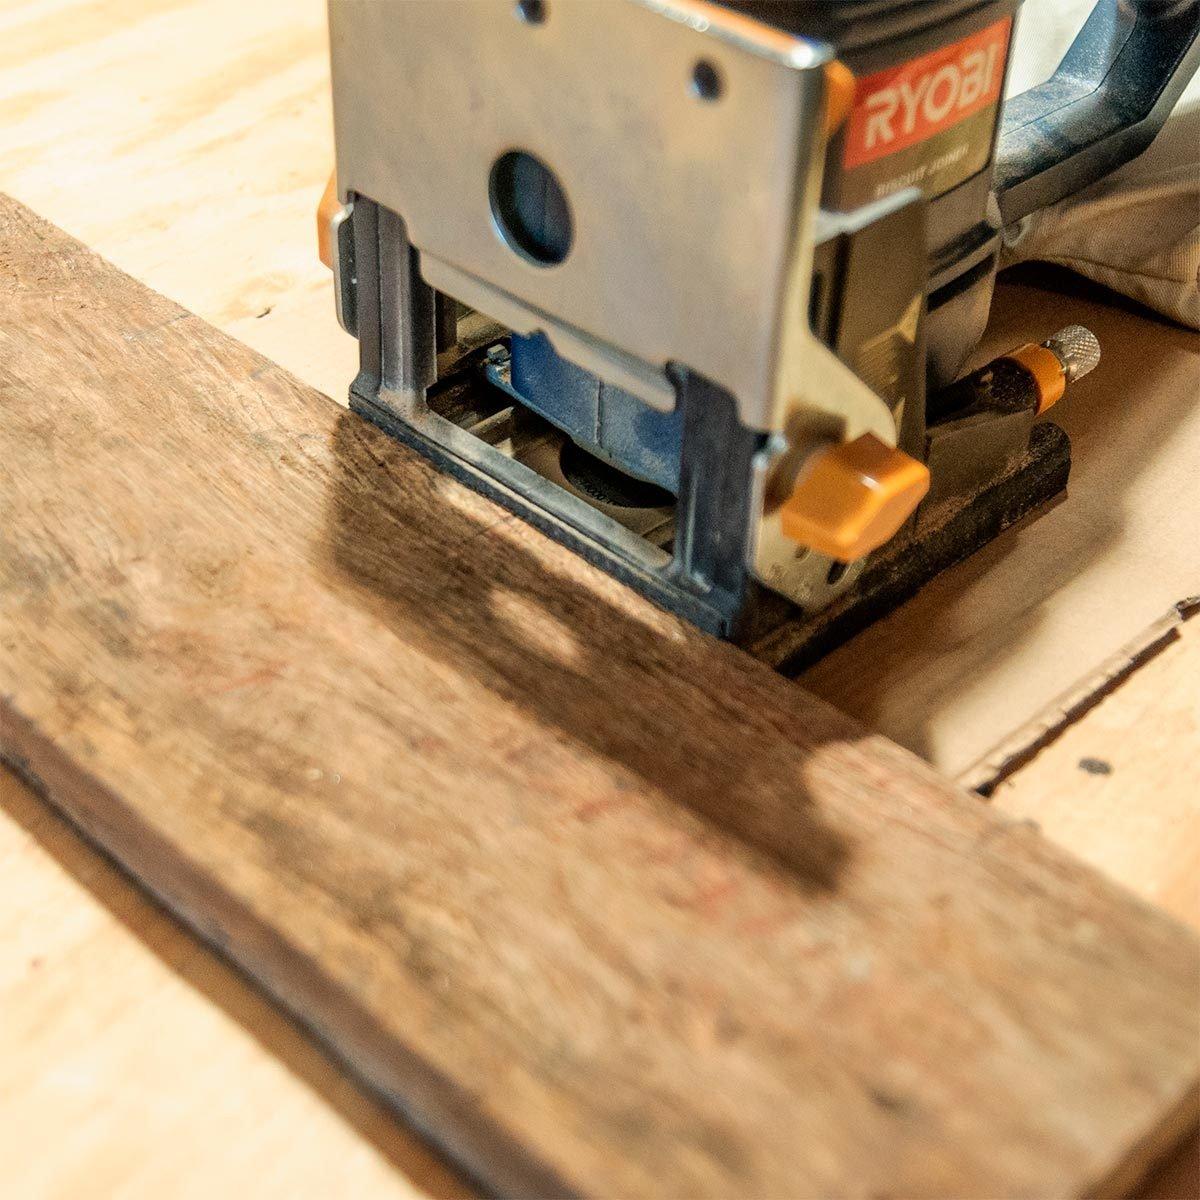 using joiner